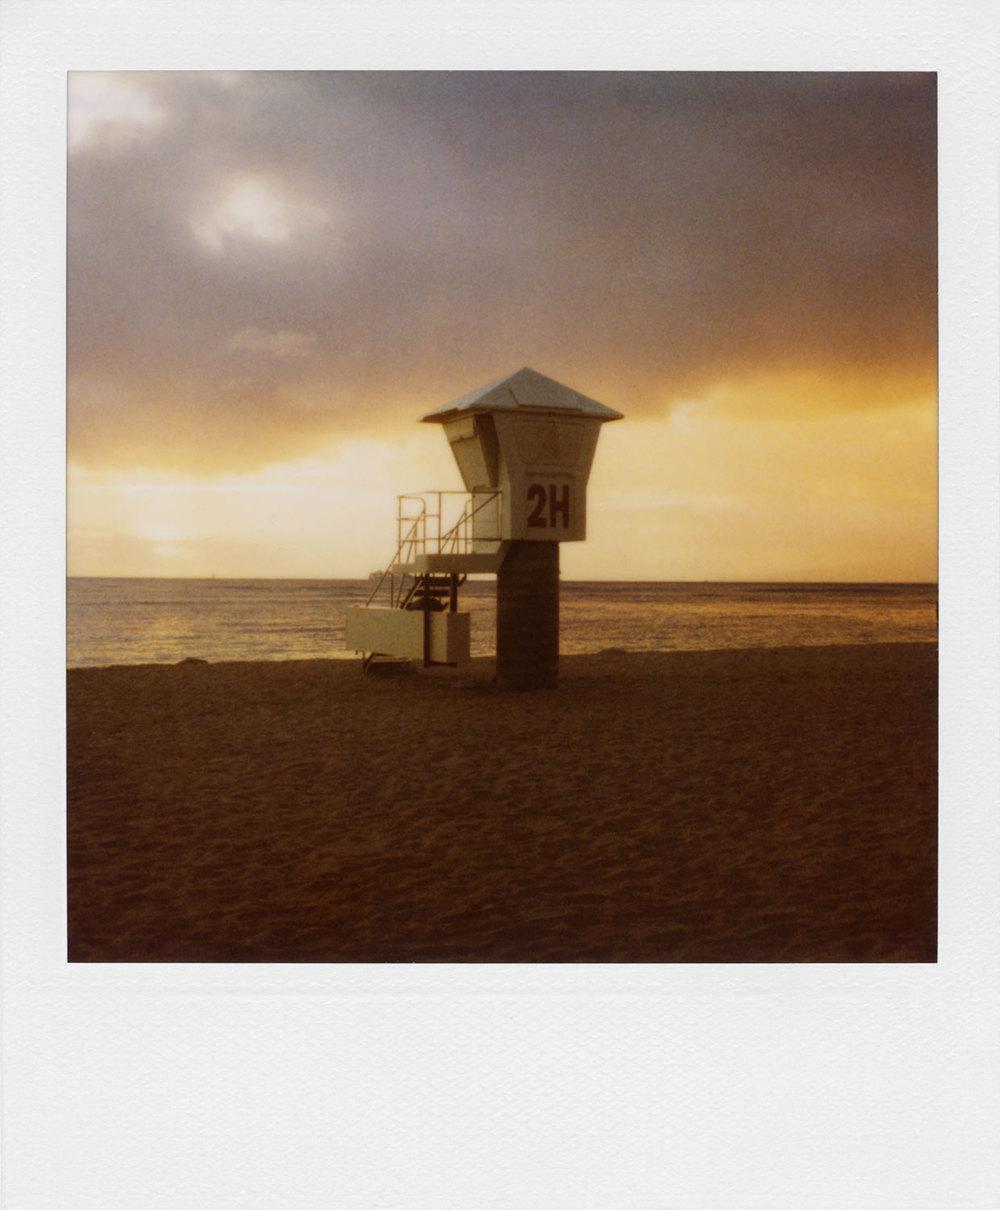 polaroid-40.jpg